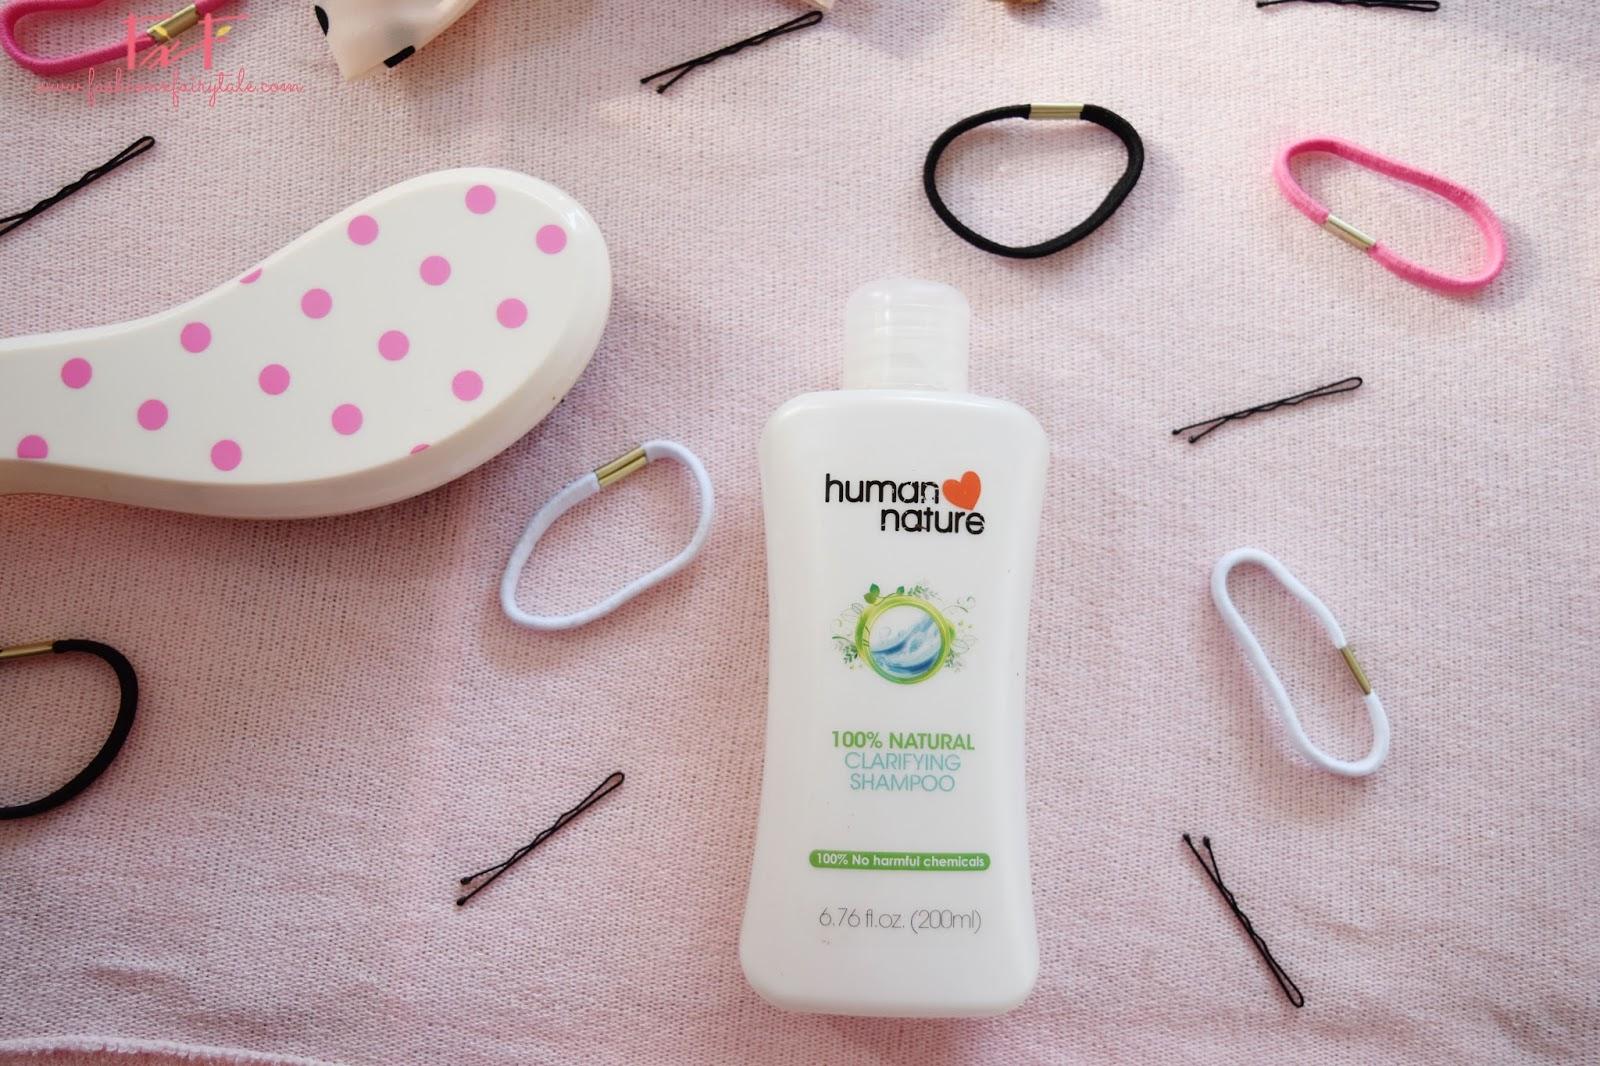 Human Nature Clarifying Shampoo | Review